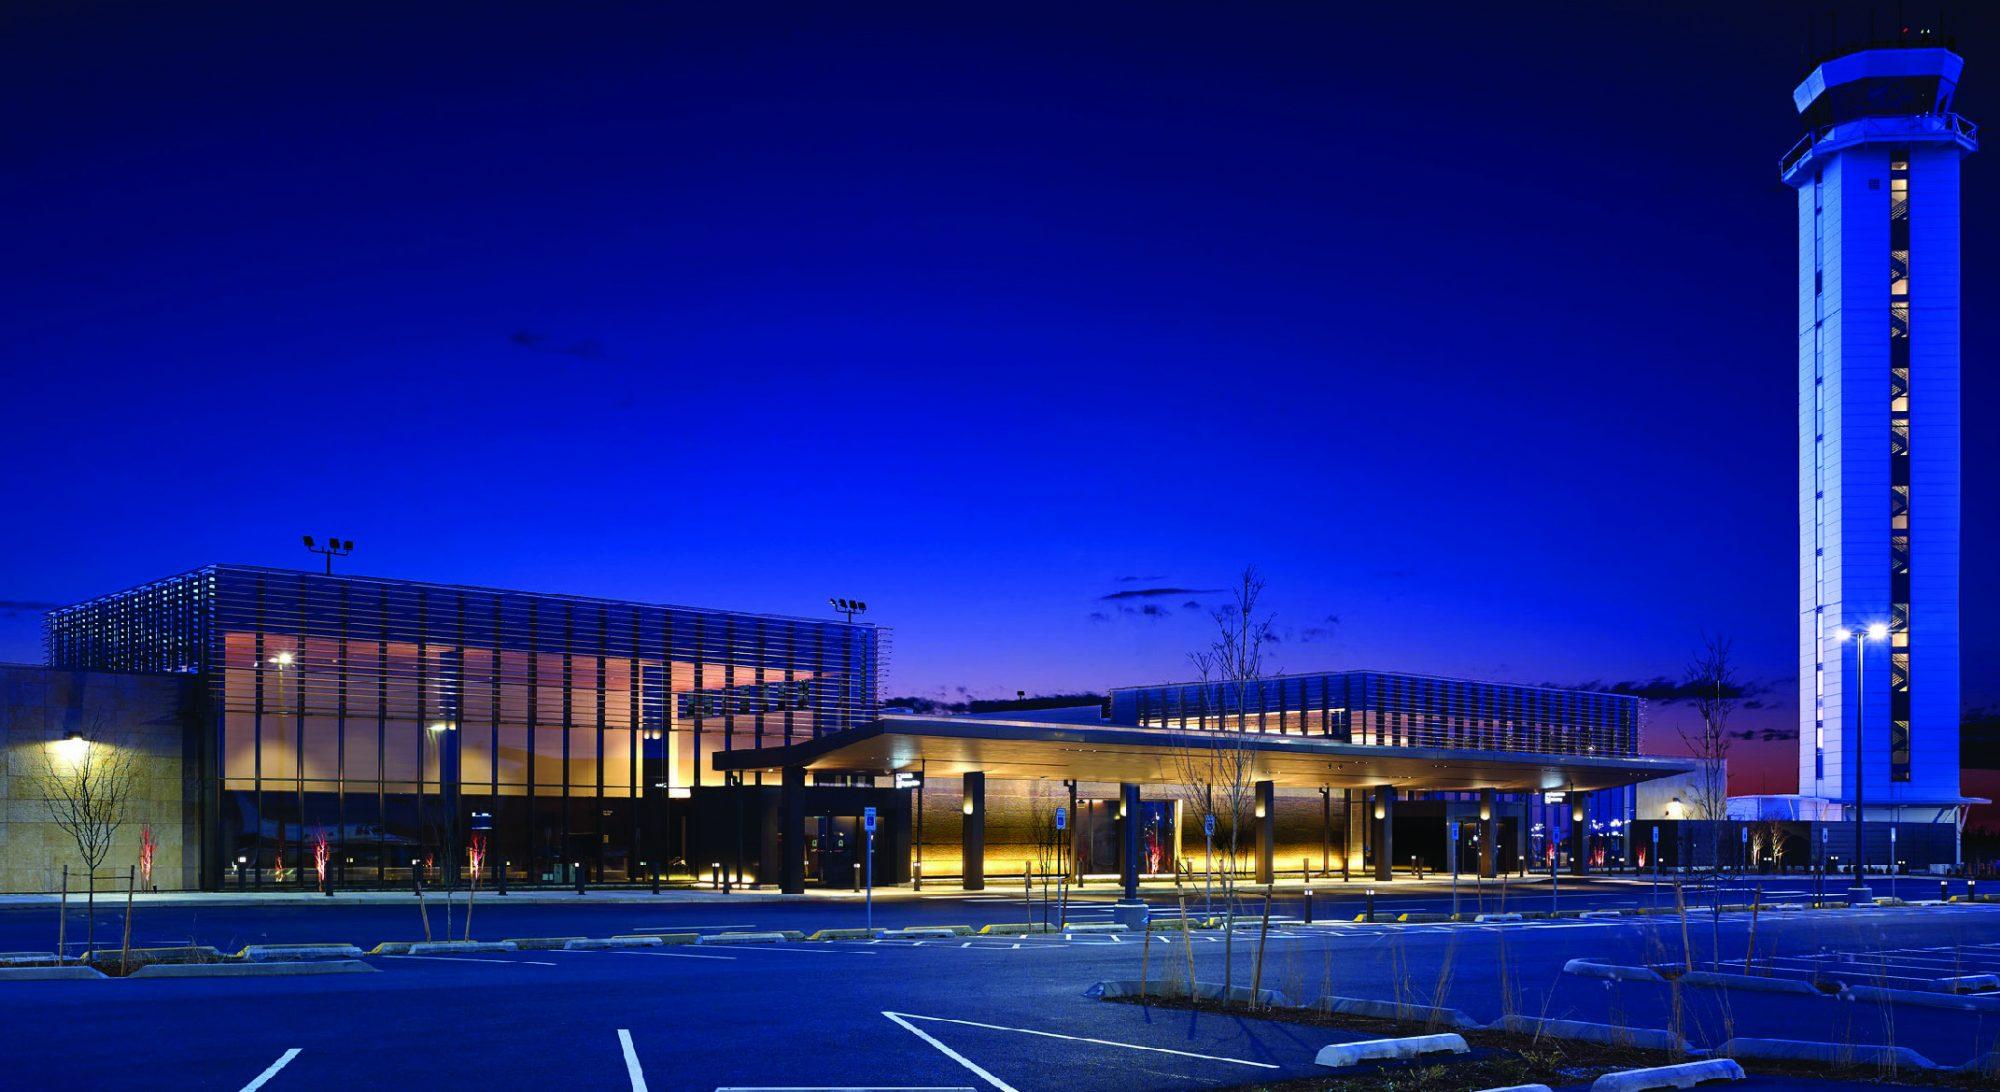 Paine Field Regional Airport